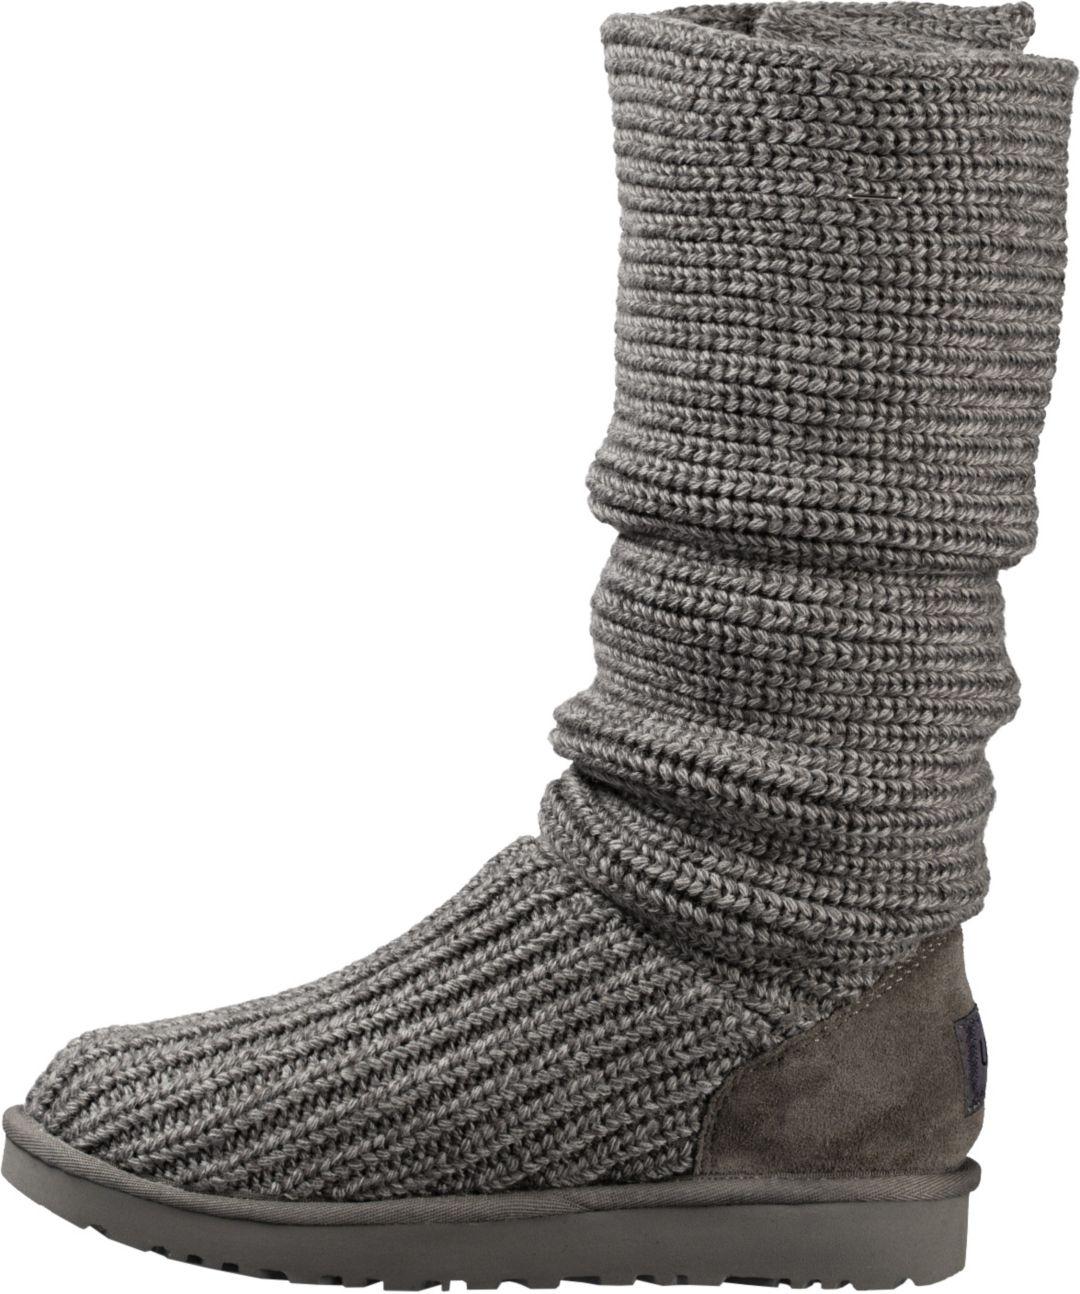 ae4c67037b8 UGG Women's Classic Cardy II Casual Boots